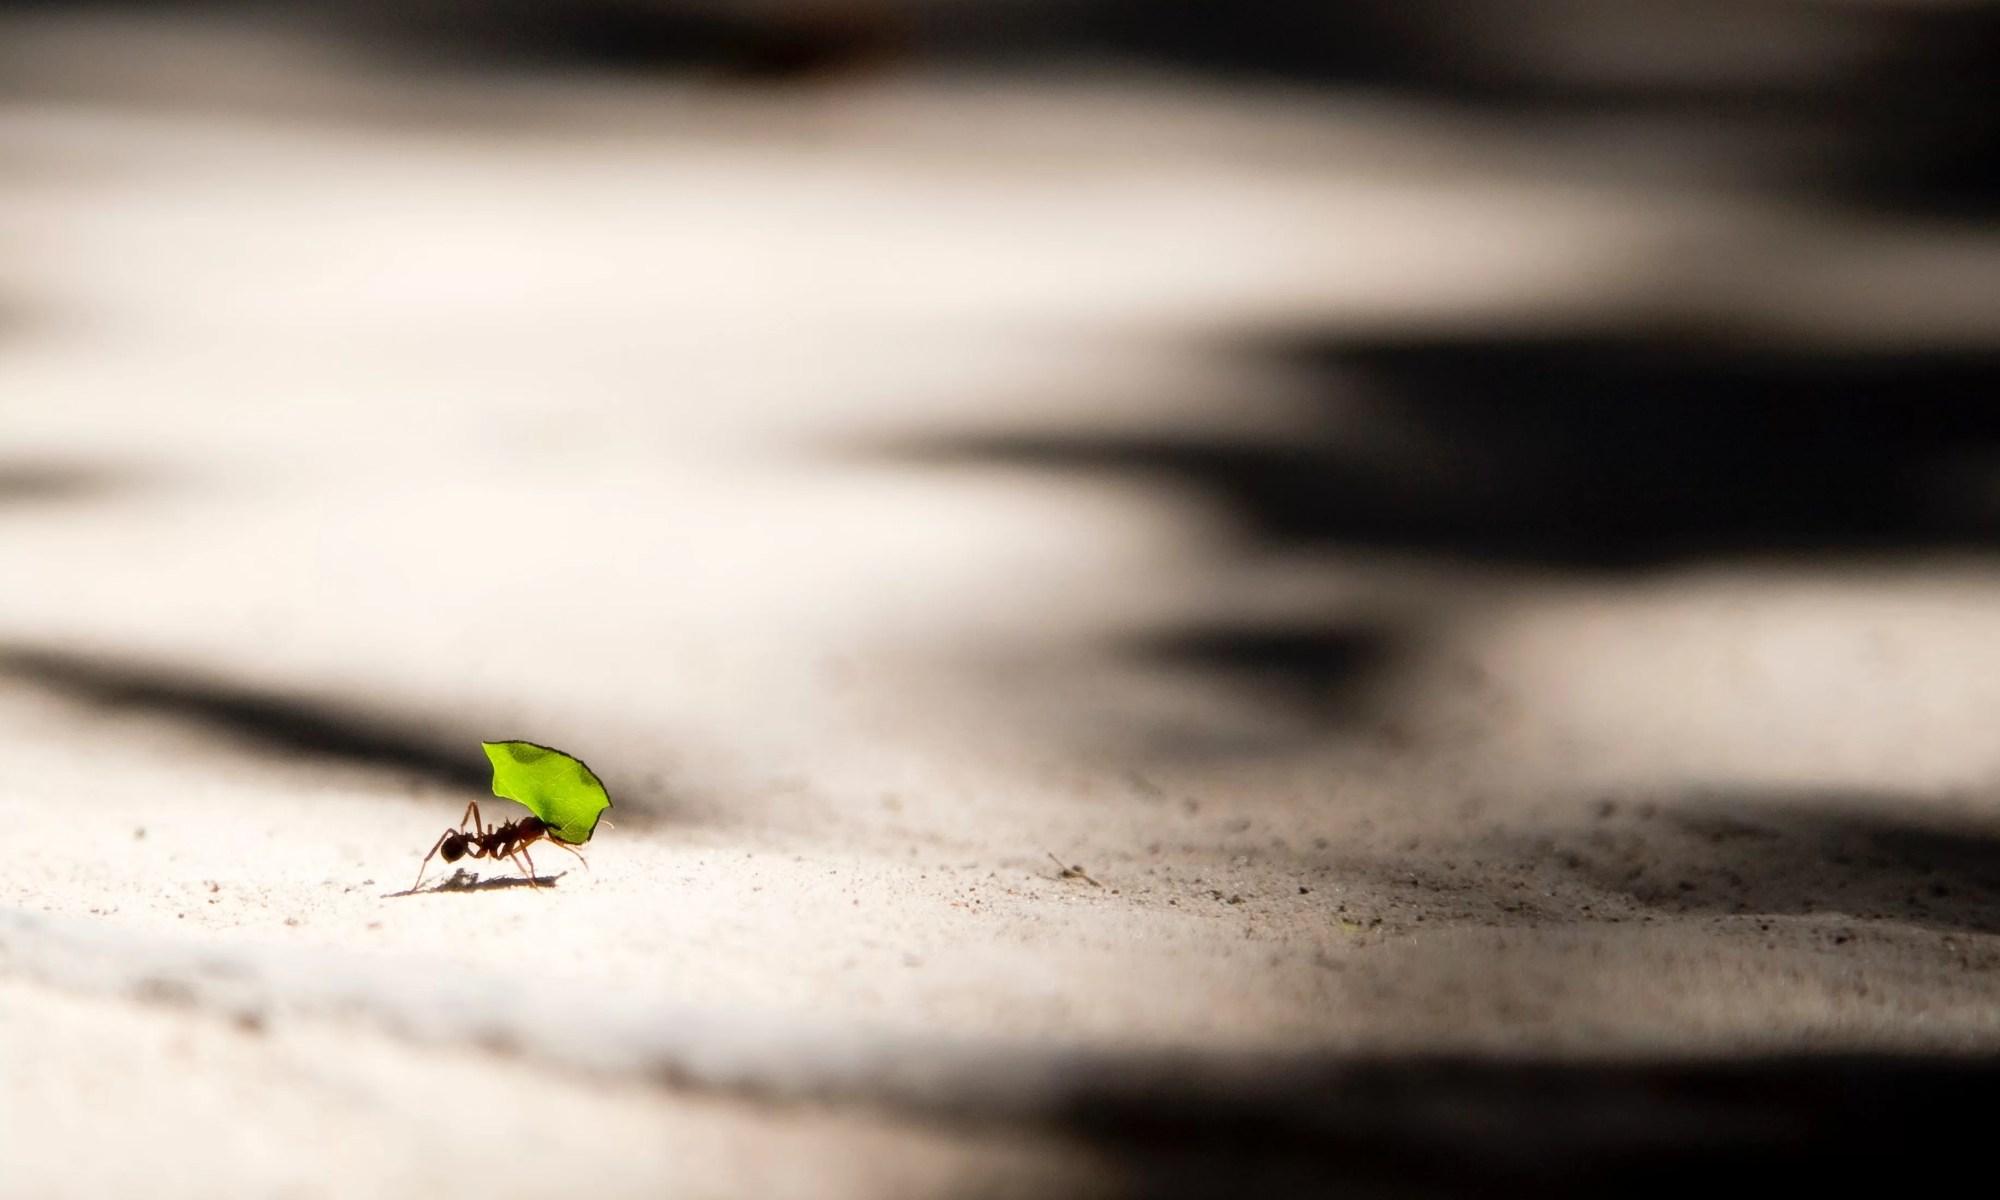 an ant carries a leaf